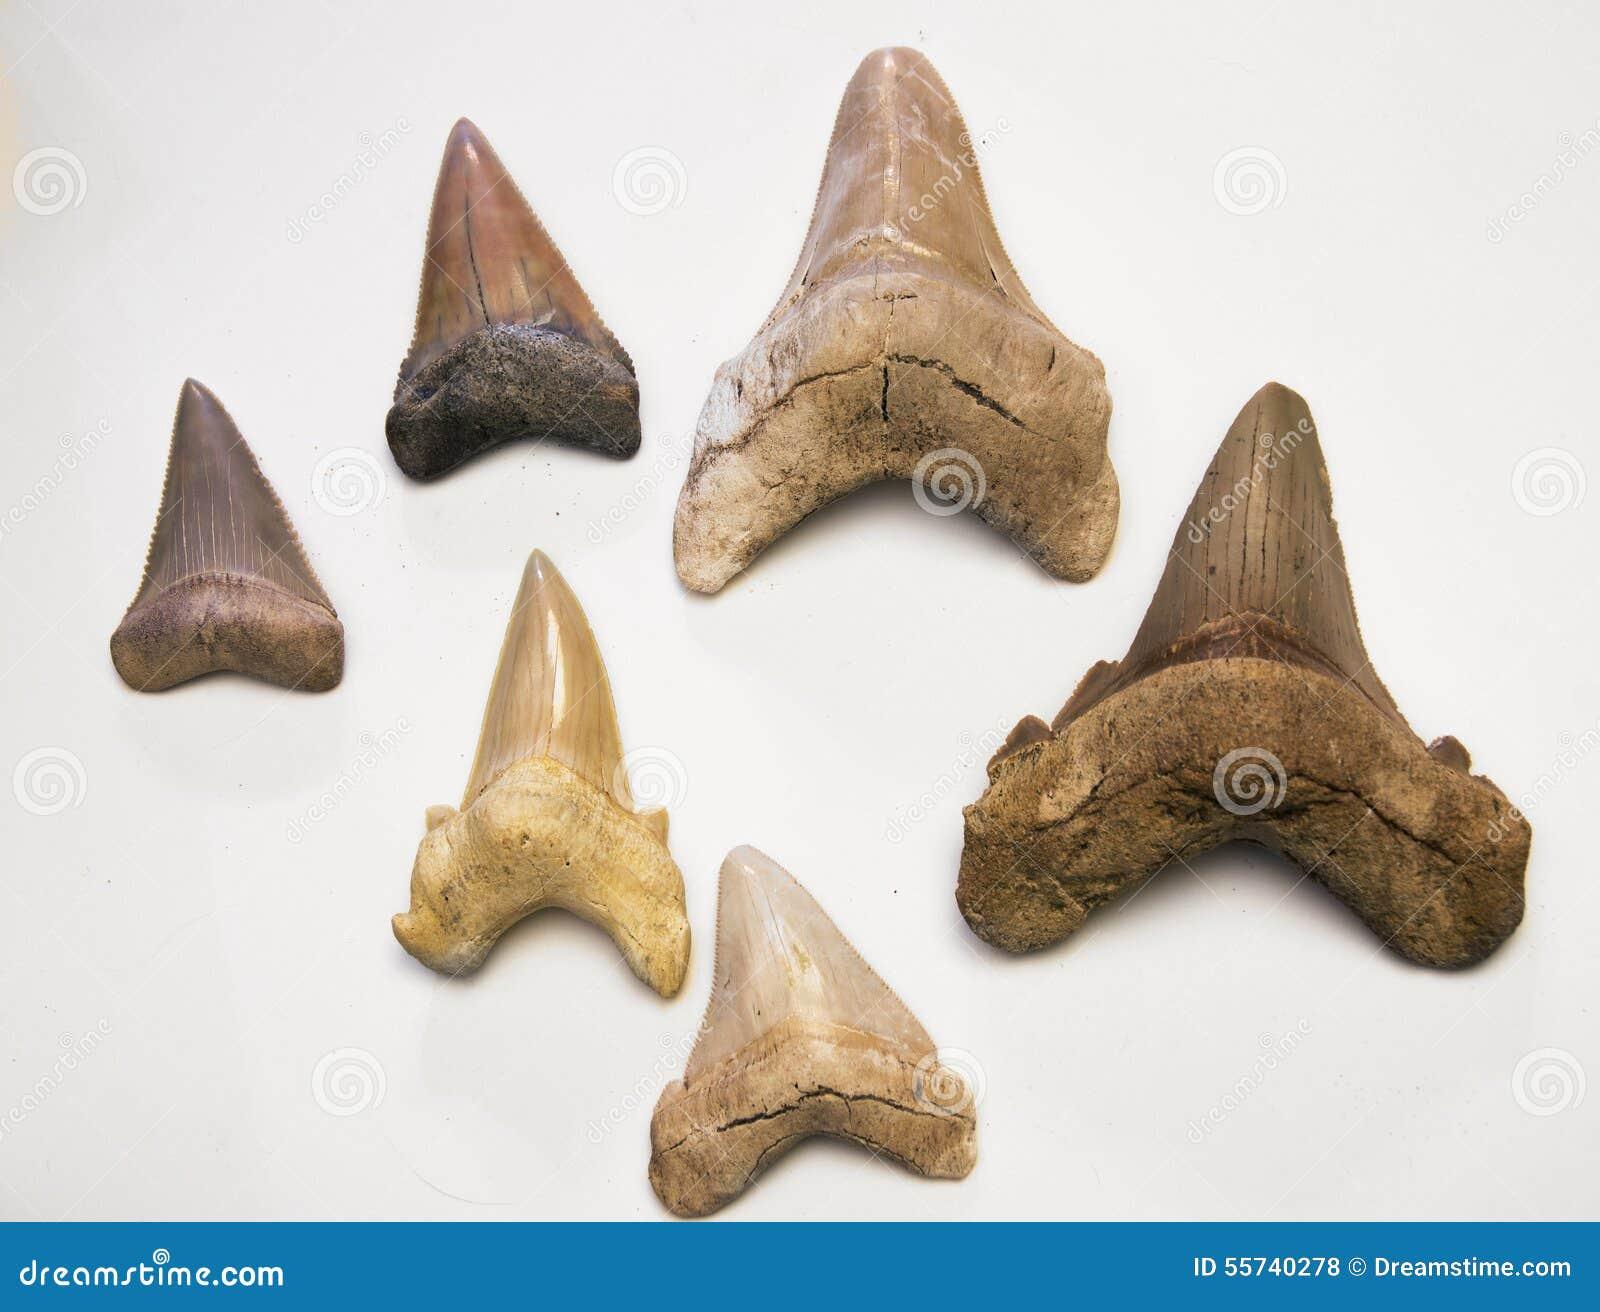 White Shark Teeth